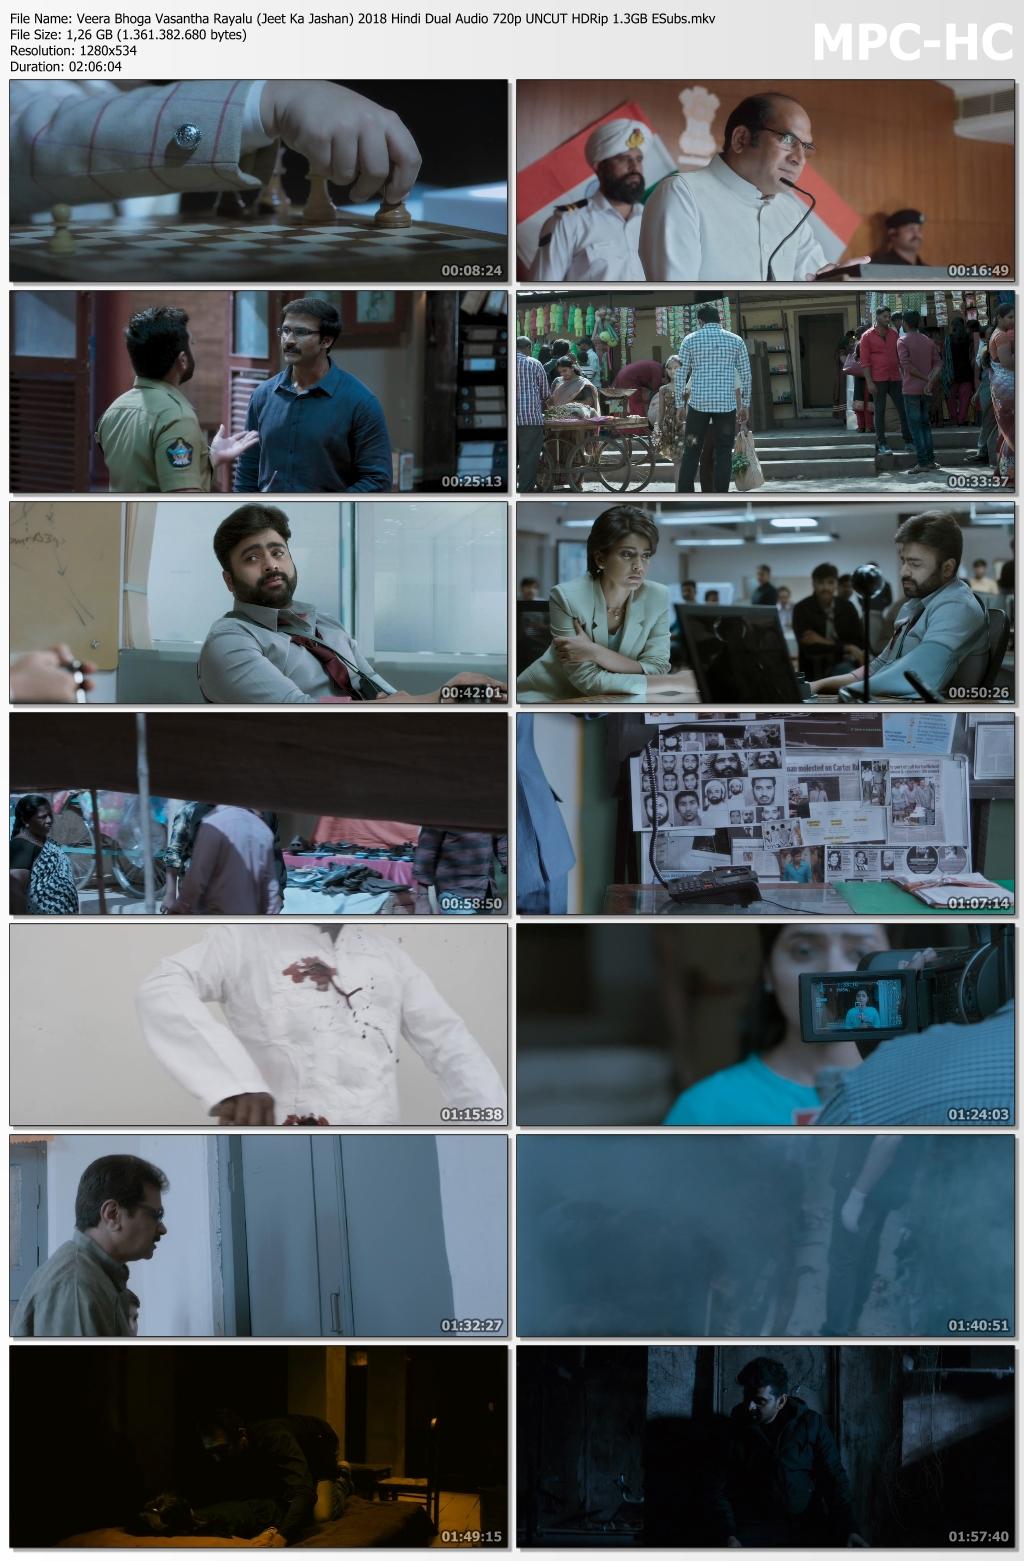 Veera-Bhoga-Vasantha-Rayalu-Jeet-Ka-Jashan-2018-Hindi-Dual-Audio-720p-UNCUT-HDRip-1-3-GB-ESubs-mkv-t